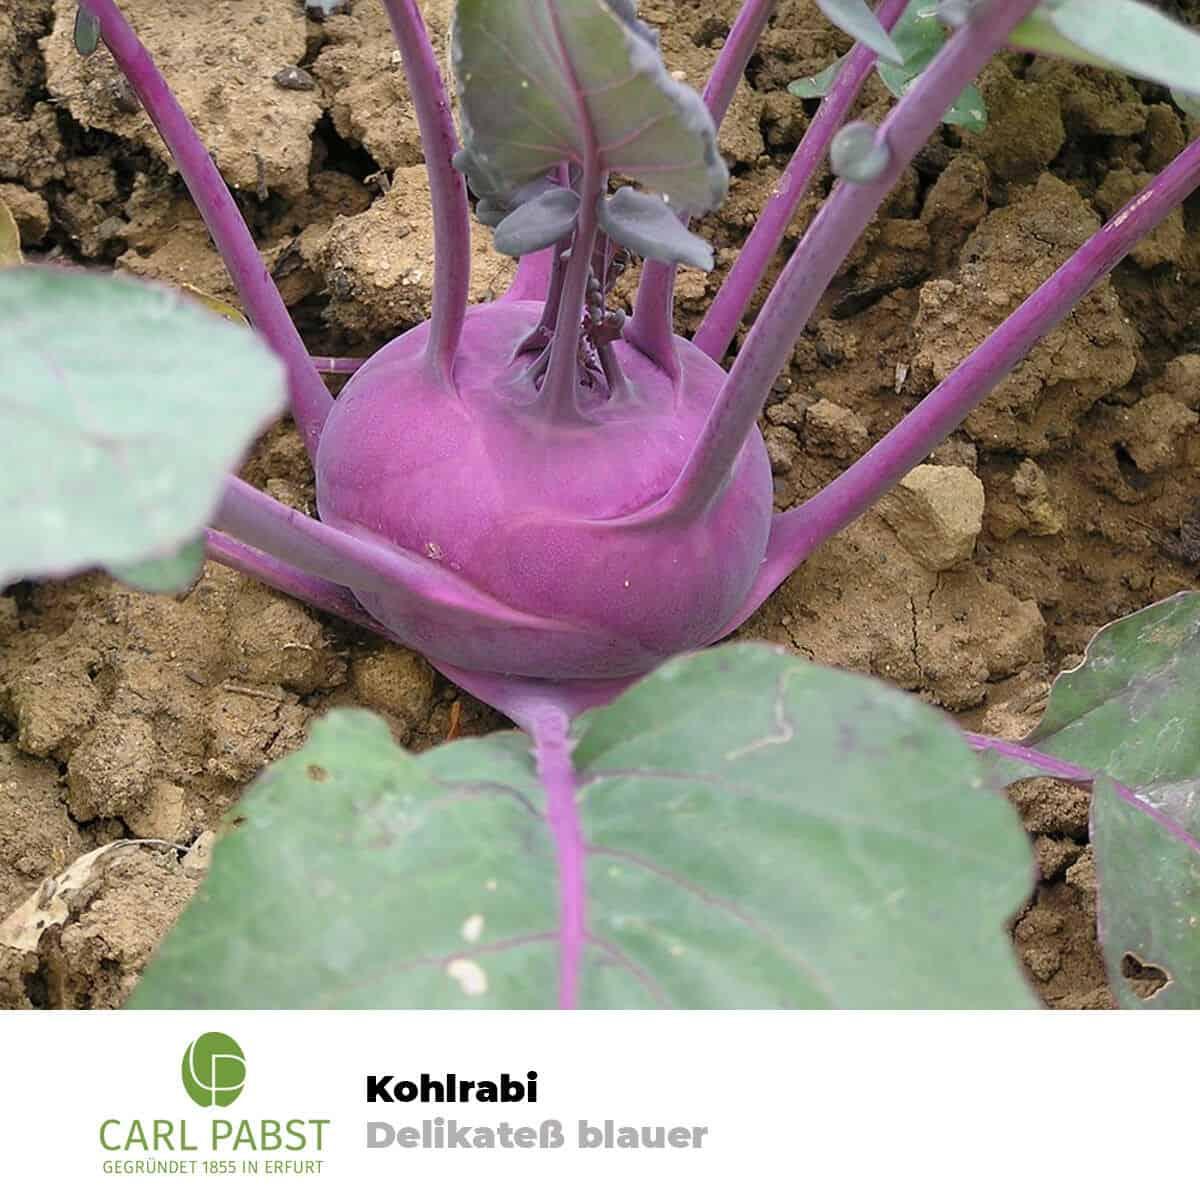 Kohlrabi Delikatess Witte Samen 100 Pflanzensamen Sämereien Samen Garten Kohl